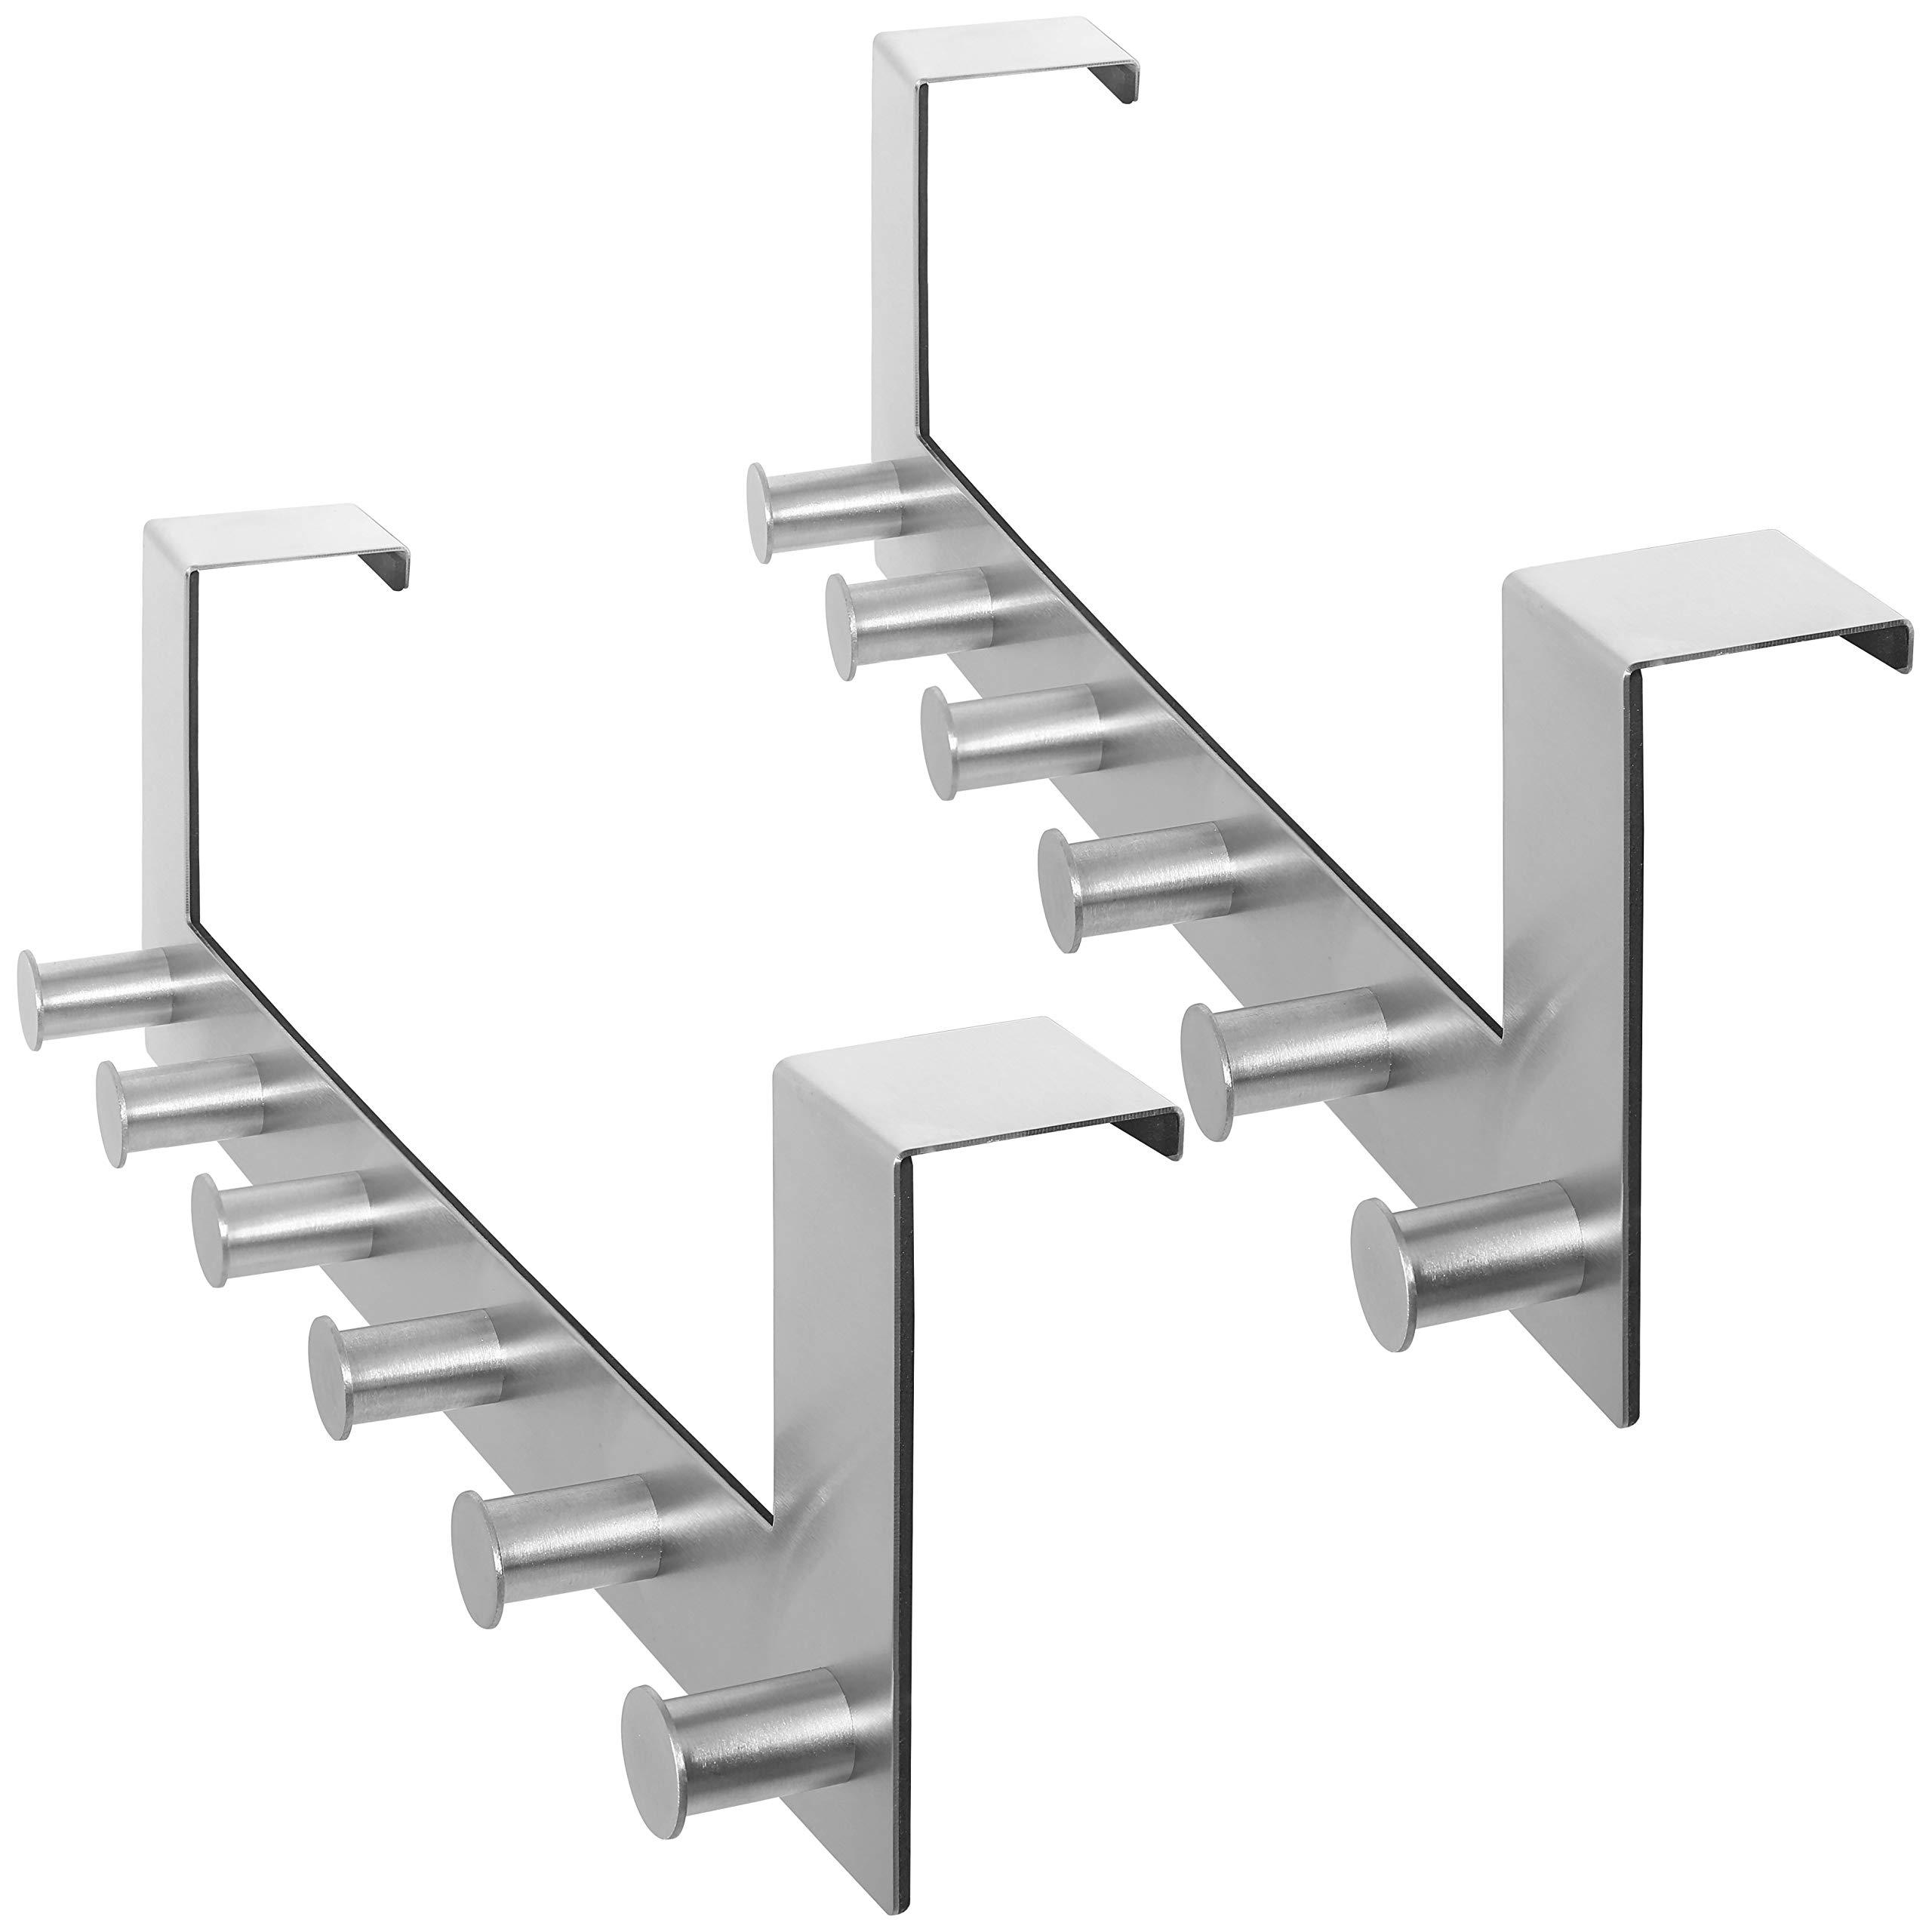 WEBI Over-The-Door Hooks : Modern, Heavy Duty, Anti-Rust, Clou Door Hanger,6 Coat Hook Pegs, Towel Holder, Utility for Coats, Towel, Hats, Bags, Scarves, Purse (6 Pegs, Stainless Steel,Satin,2 Packs) by WEBI (Image #1)